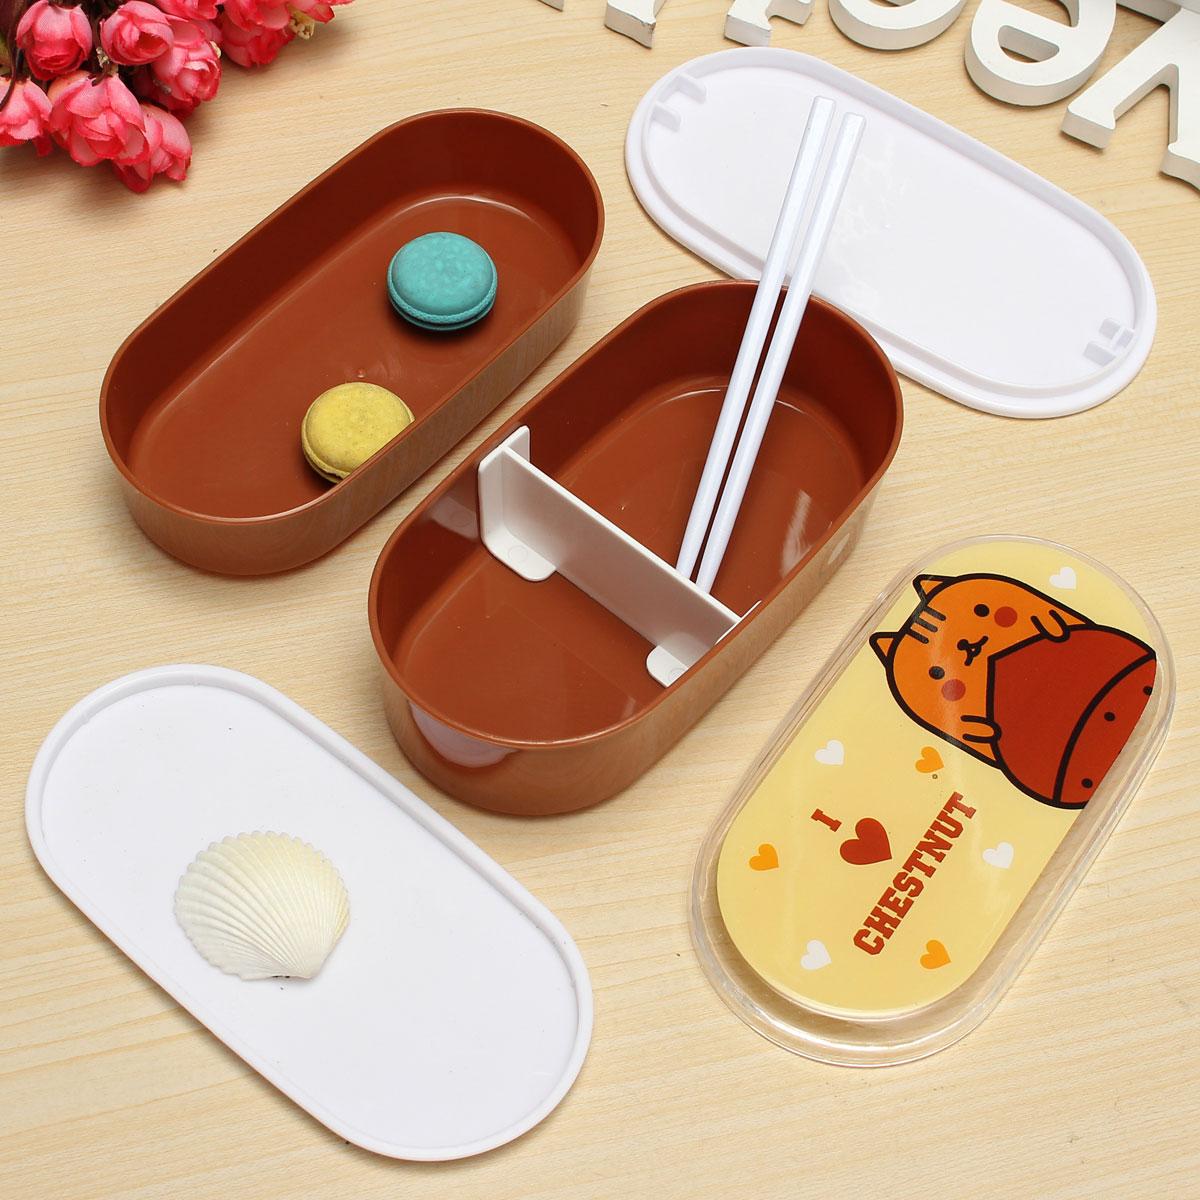 student cartoon lunch box food container storage portable bento box chopsticks lazada singapore. Black Bedroom Furniture Sets. Home Design Ideas